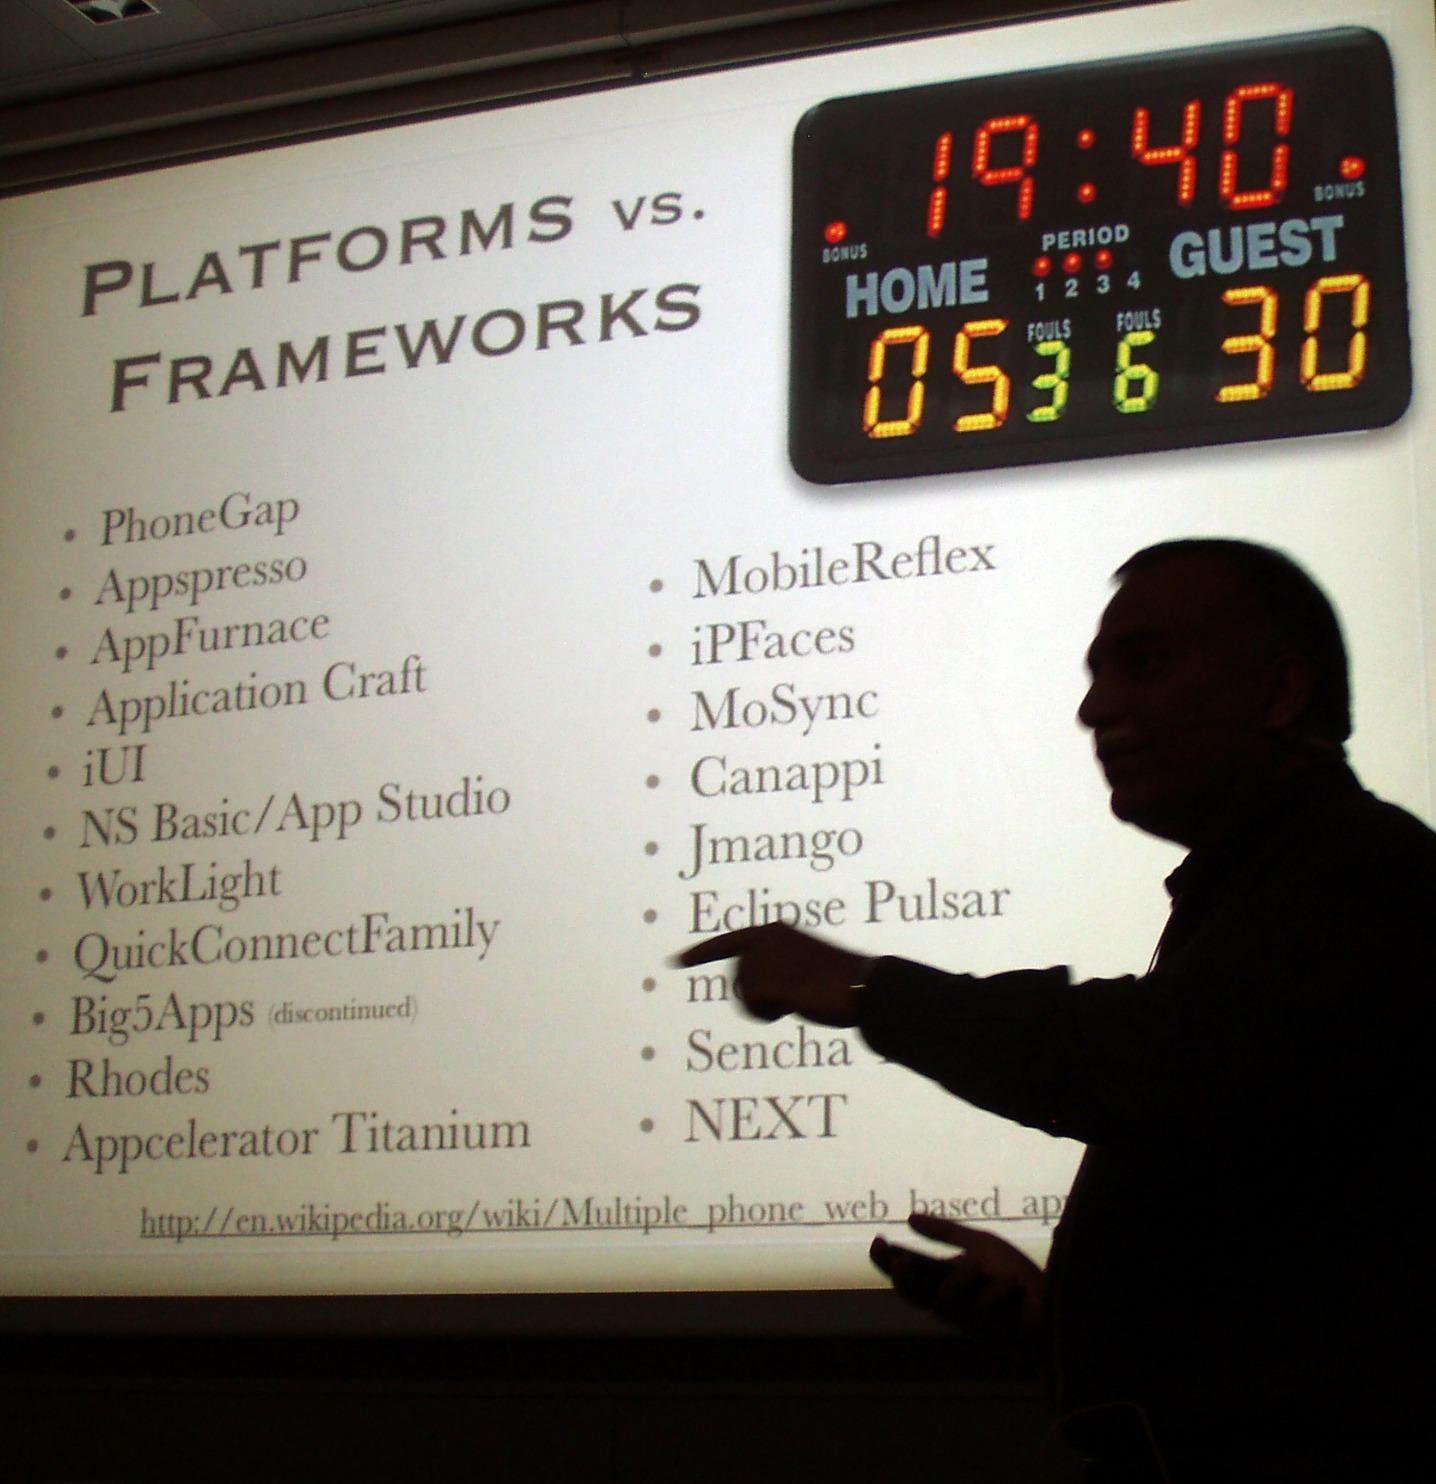 Local.ch's Vikram Kriplaney speaking about mobile platform vs. frameworks at Mobile Monday Zurich